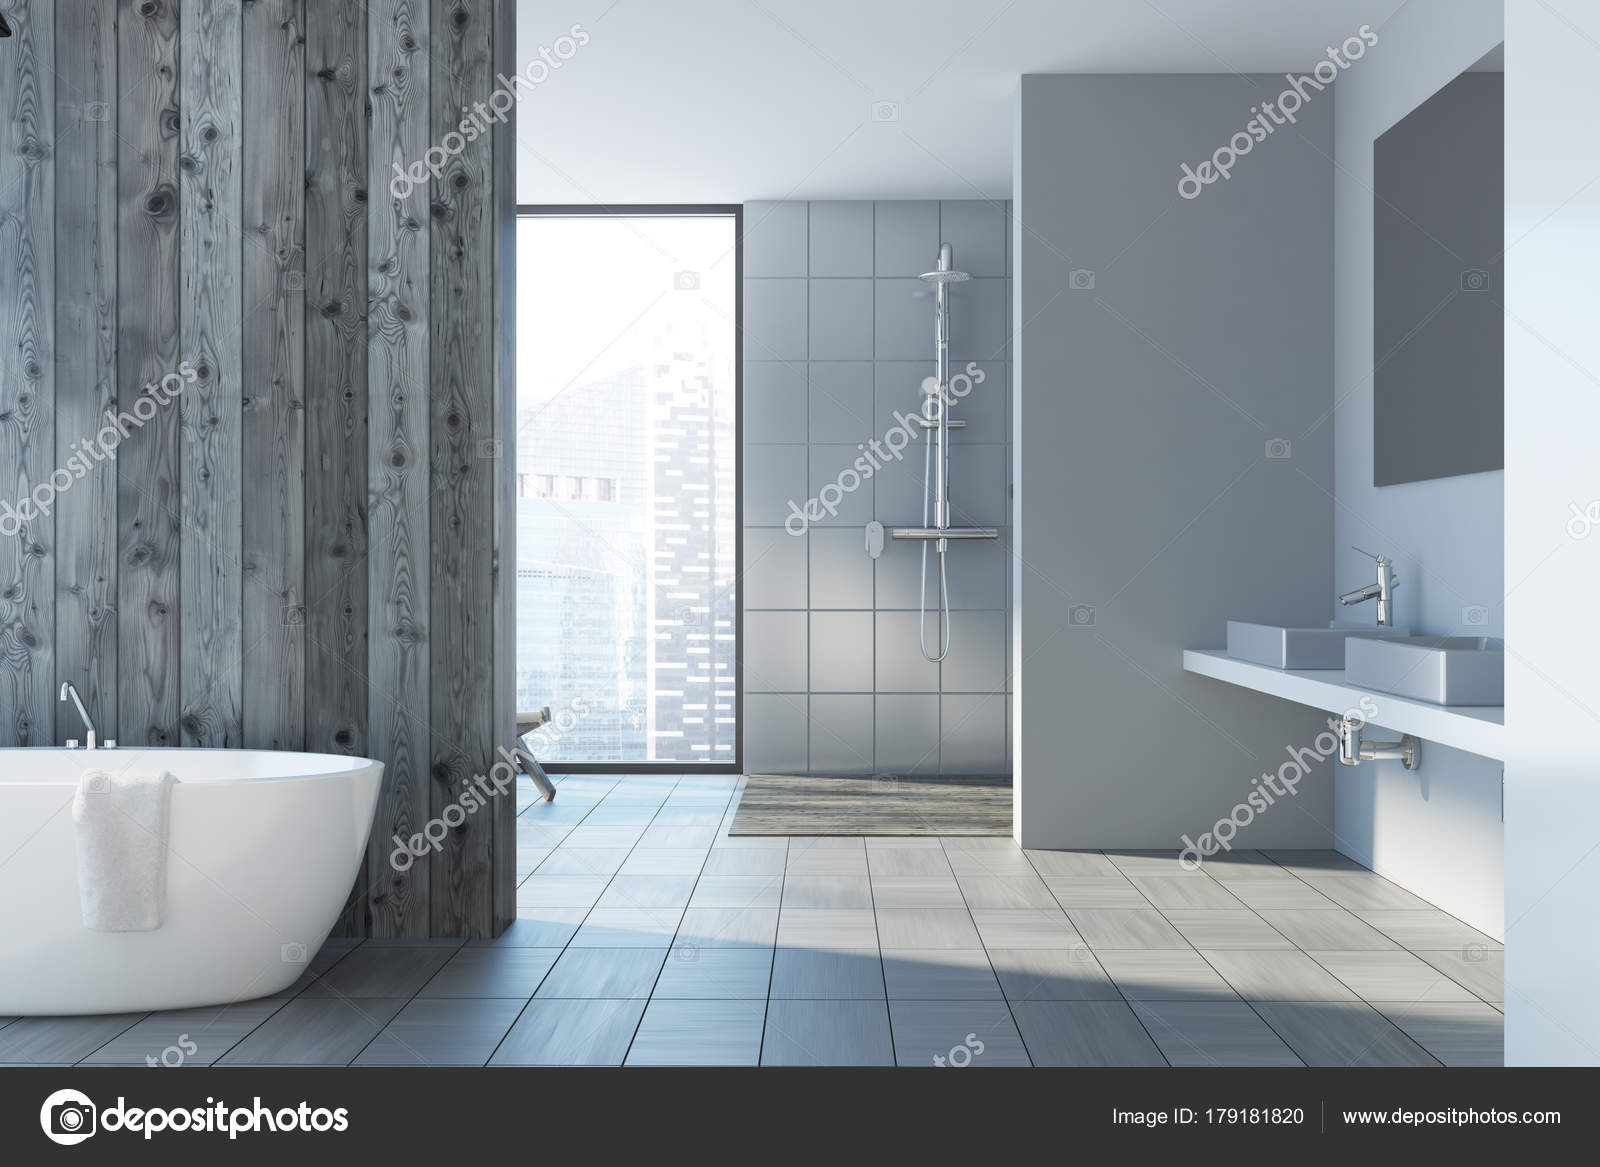 https://st3.depositphotos.com/2673929/17918/i/1600/depositphotos_179181820-stockafbeelding-grijs-en-houten-badkamer-interieur.jpg